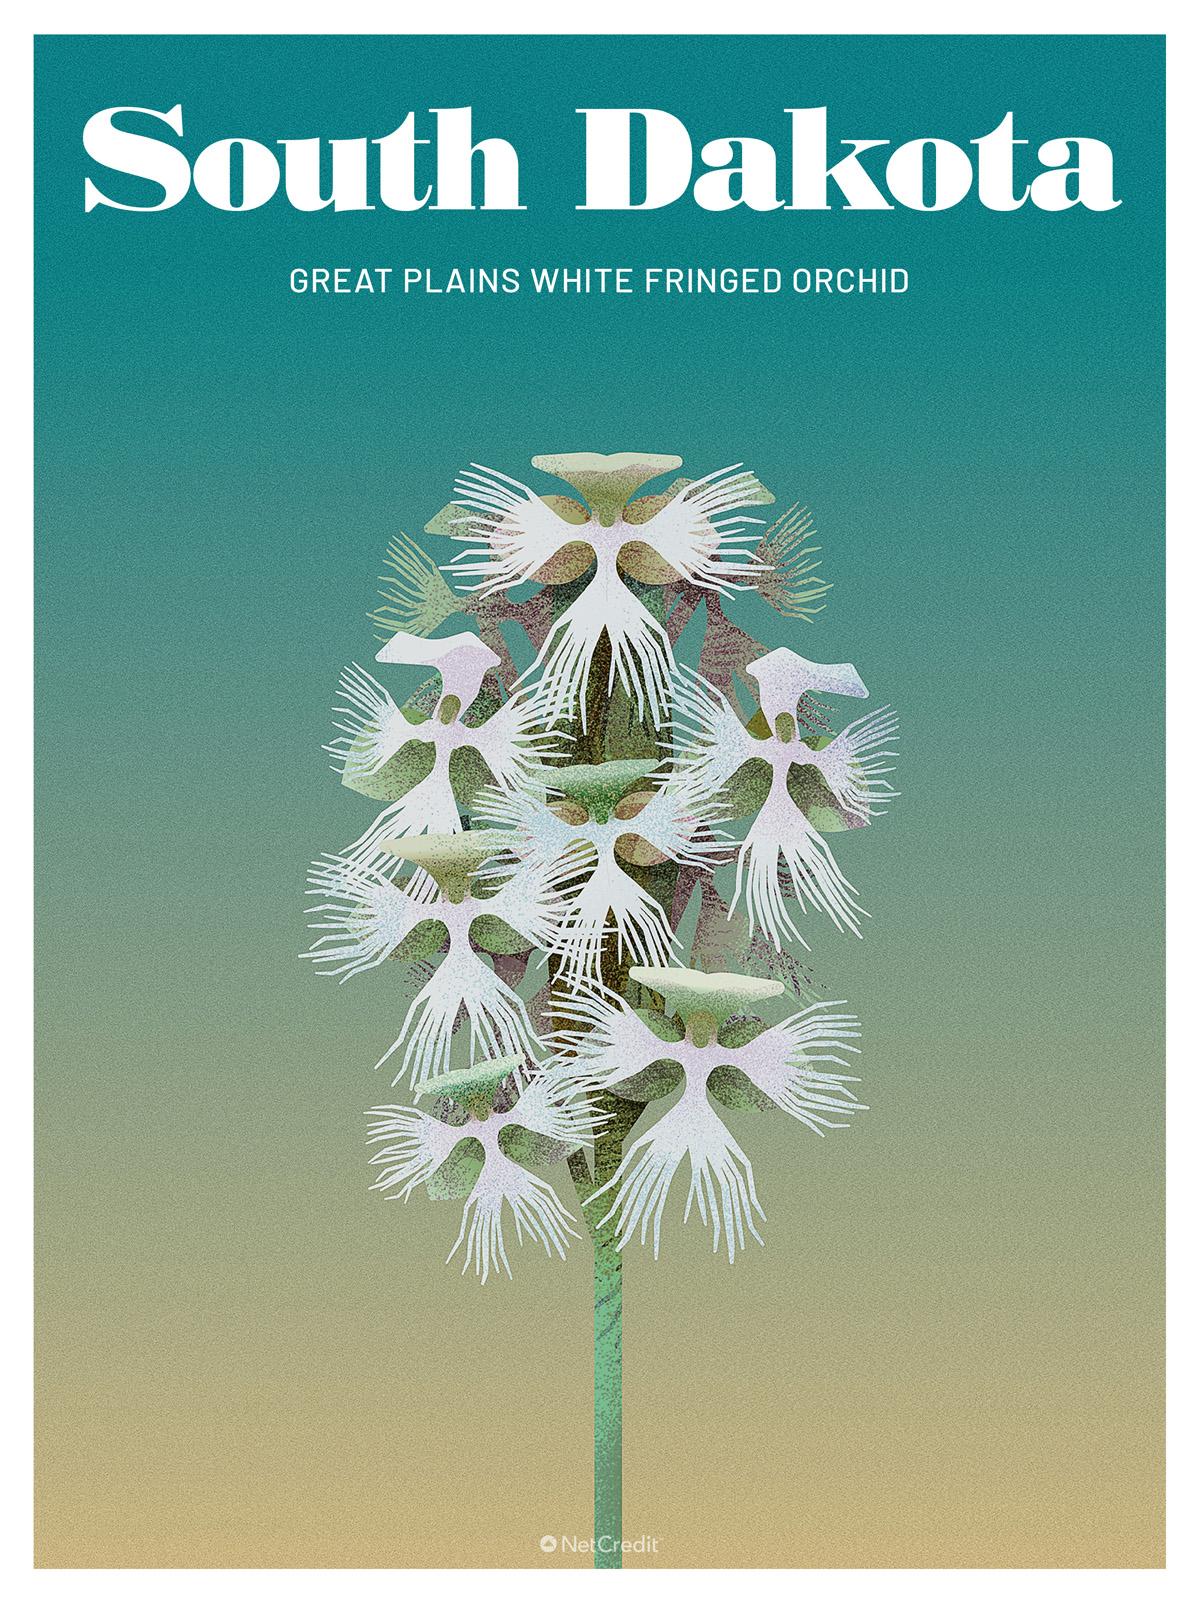 Endangered Plant in South Dakota: White Fringed Orchid